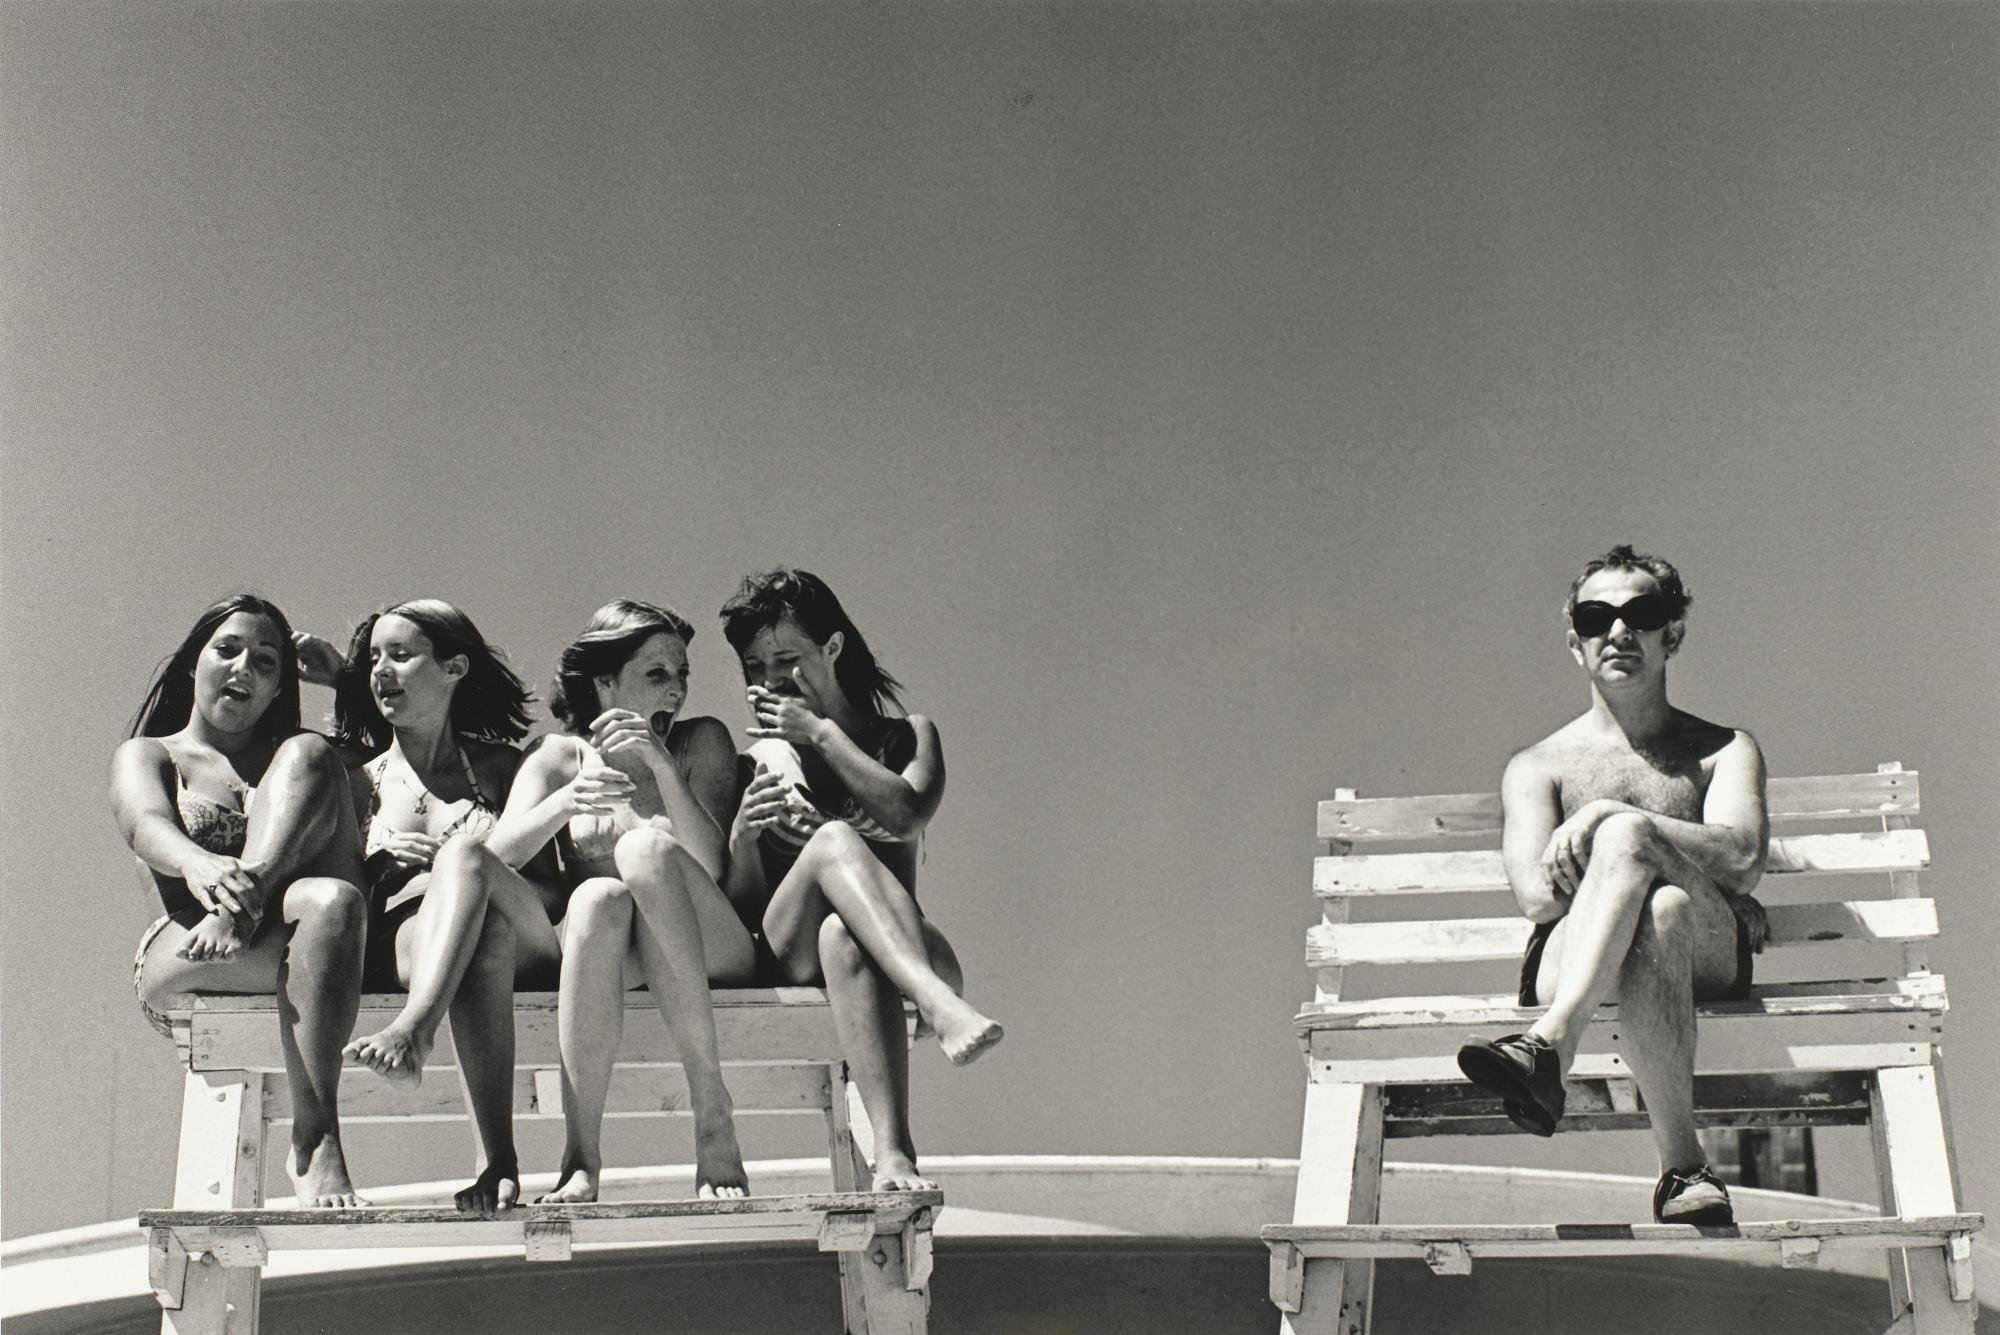 Joseph Szabo-Lifeguard-1978